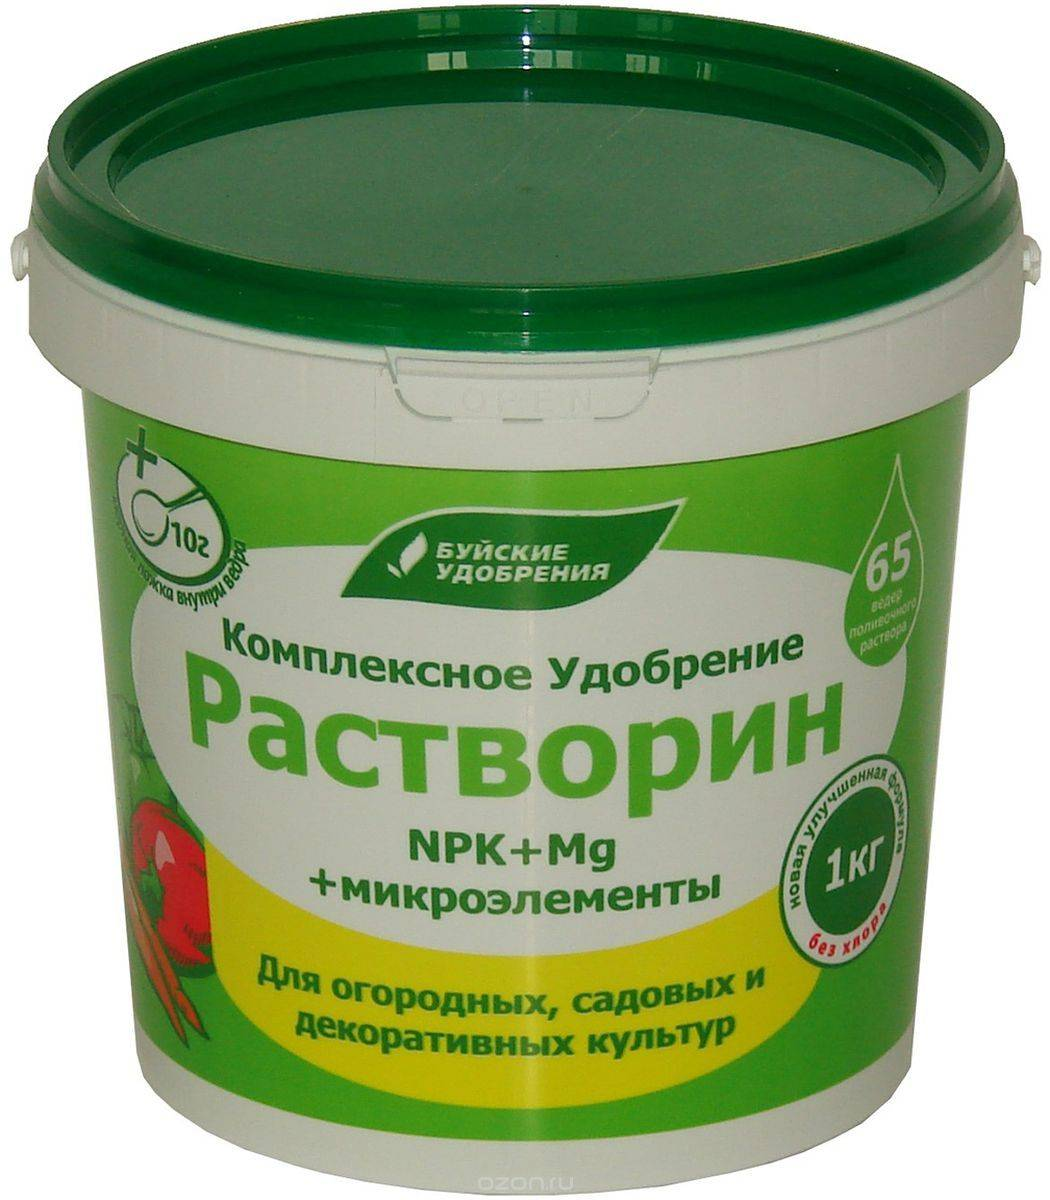 "Удобрение ""растворин"". состав, применение препарата"